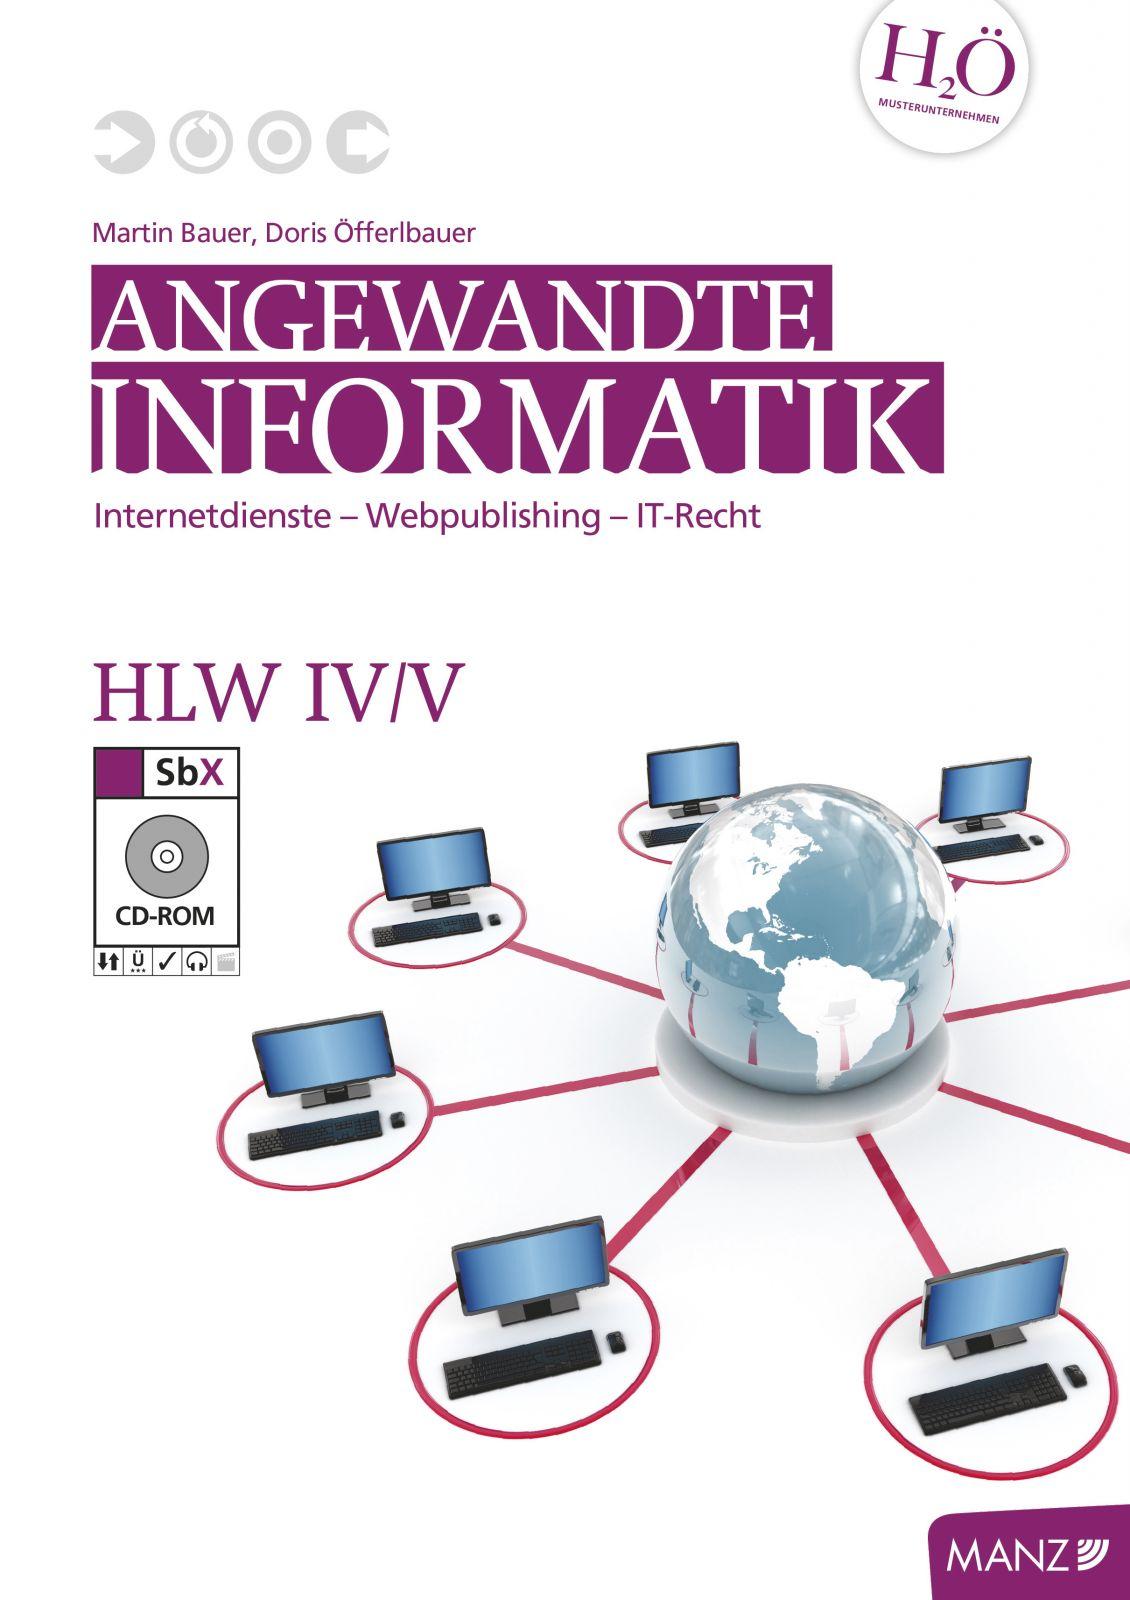 download bis 99 3rd international conference on business information systems poznan poland 1416 april 1999